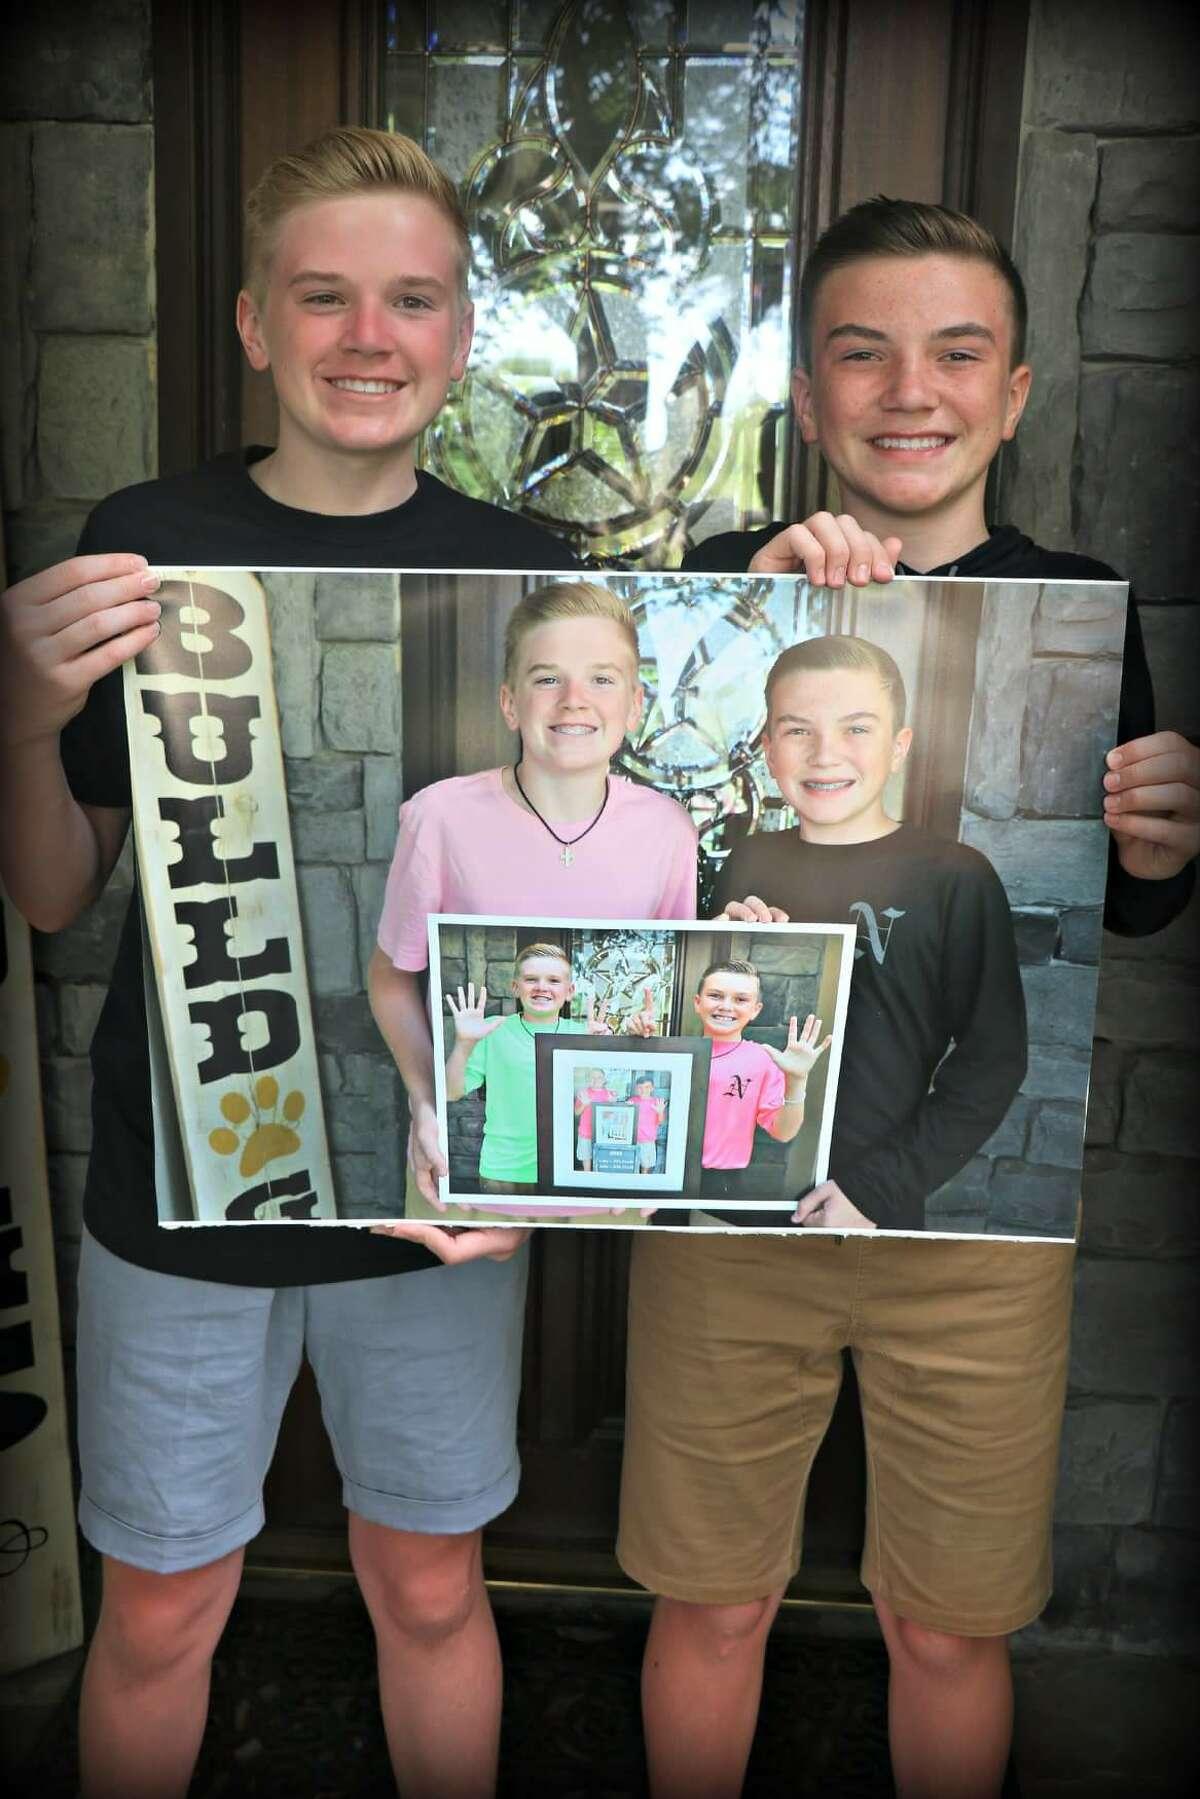 Jake and Luke Harrison - 9th and 8th grade, Nederland.